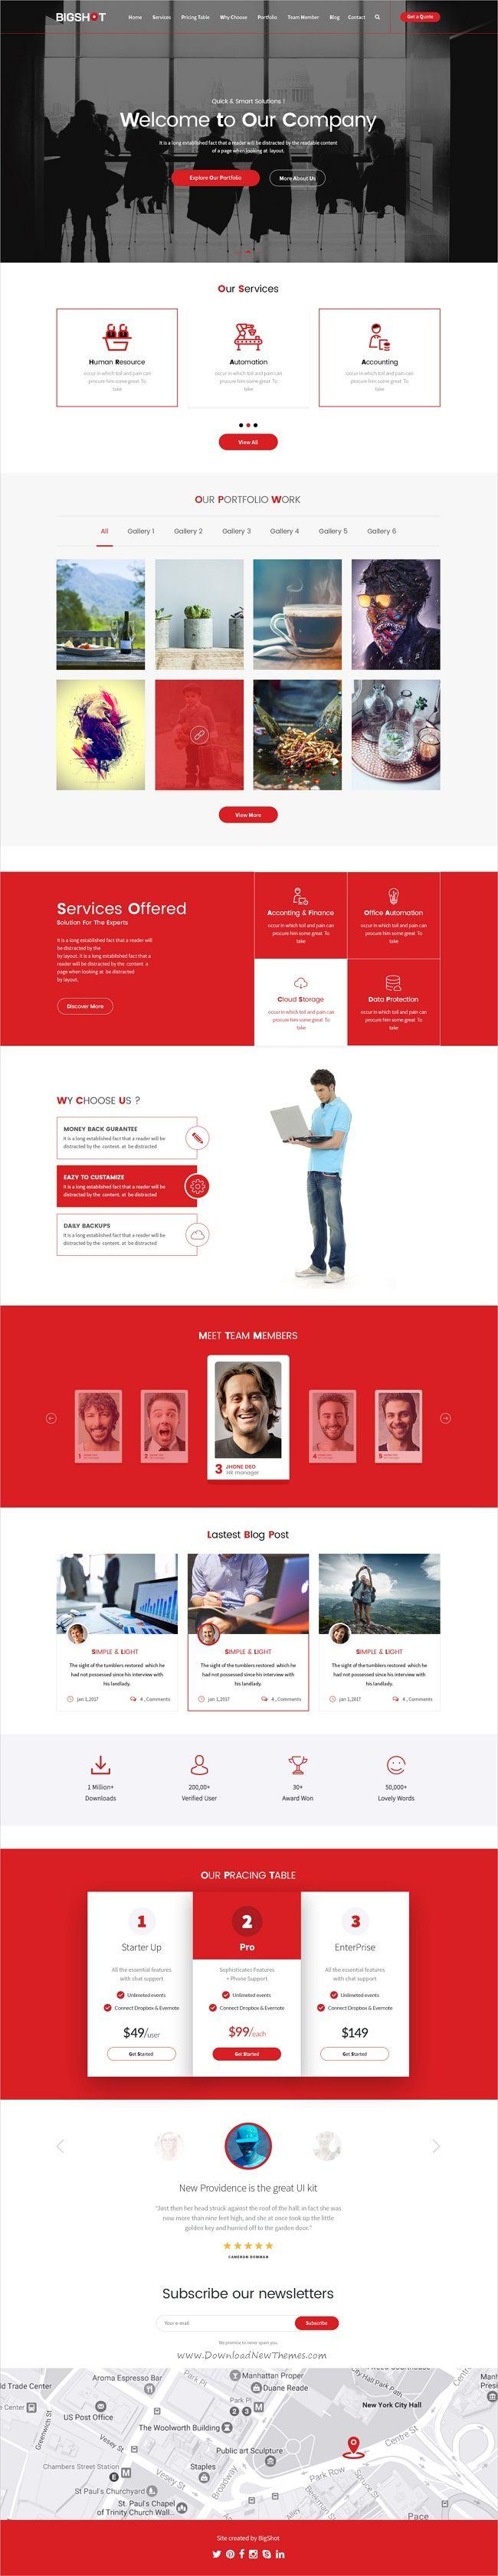 Best 25+ One page website ideas on Pinterest   Web layout, Un ...